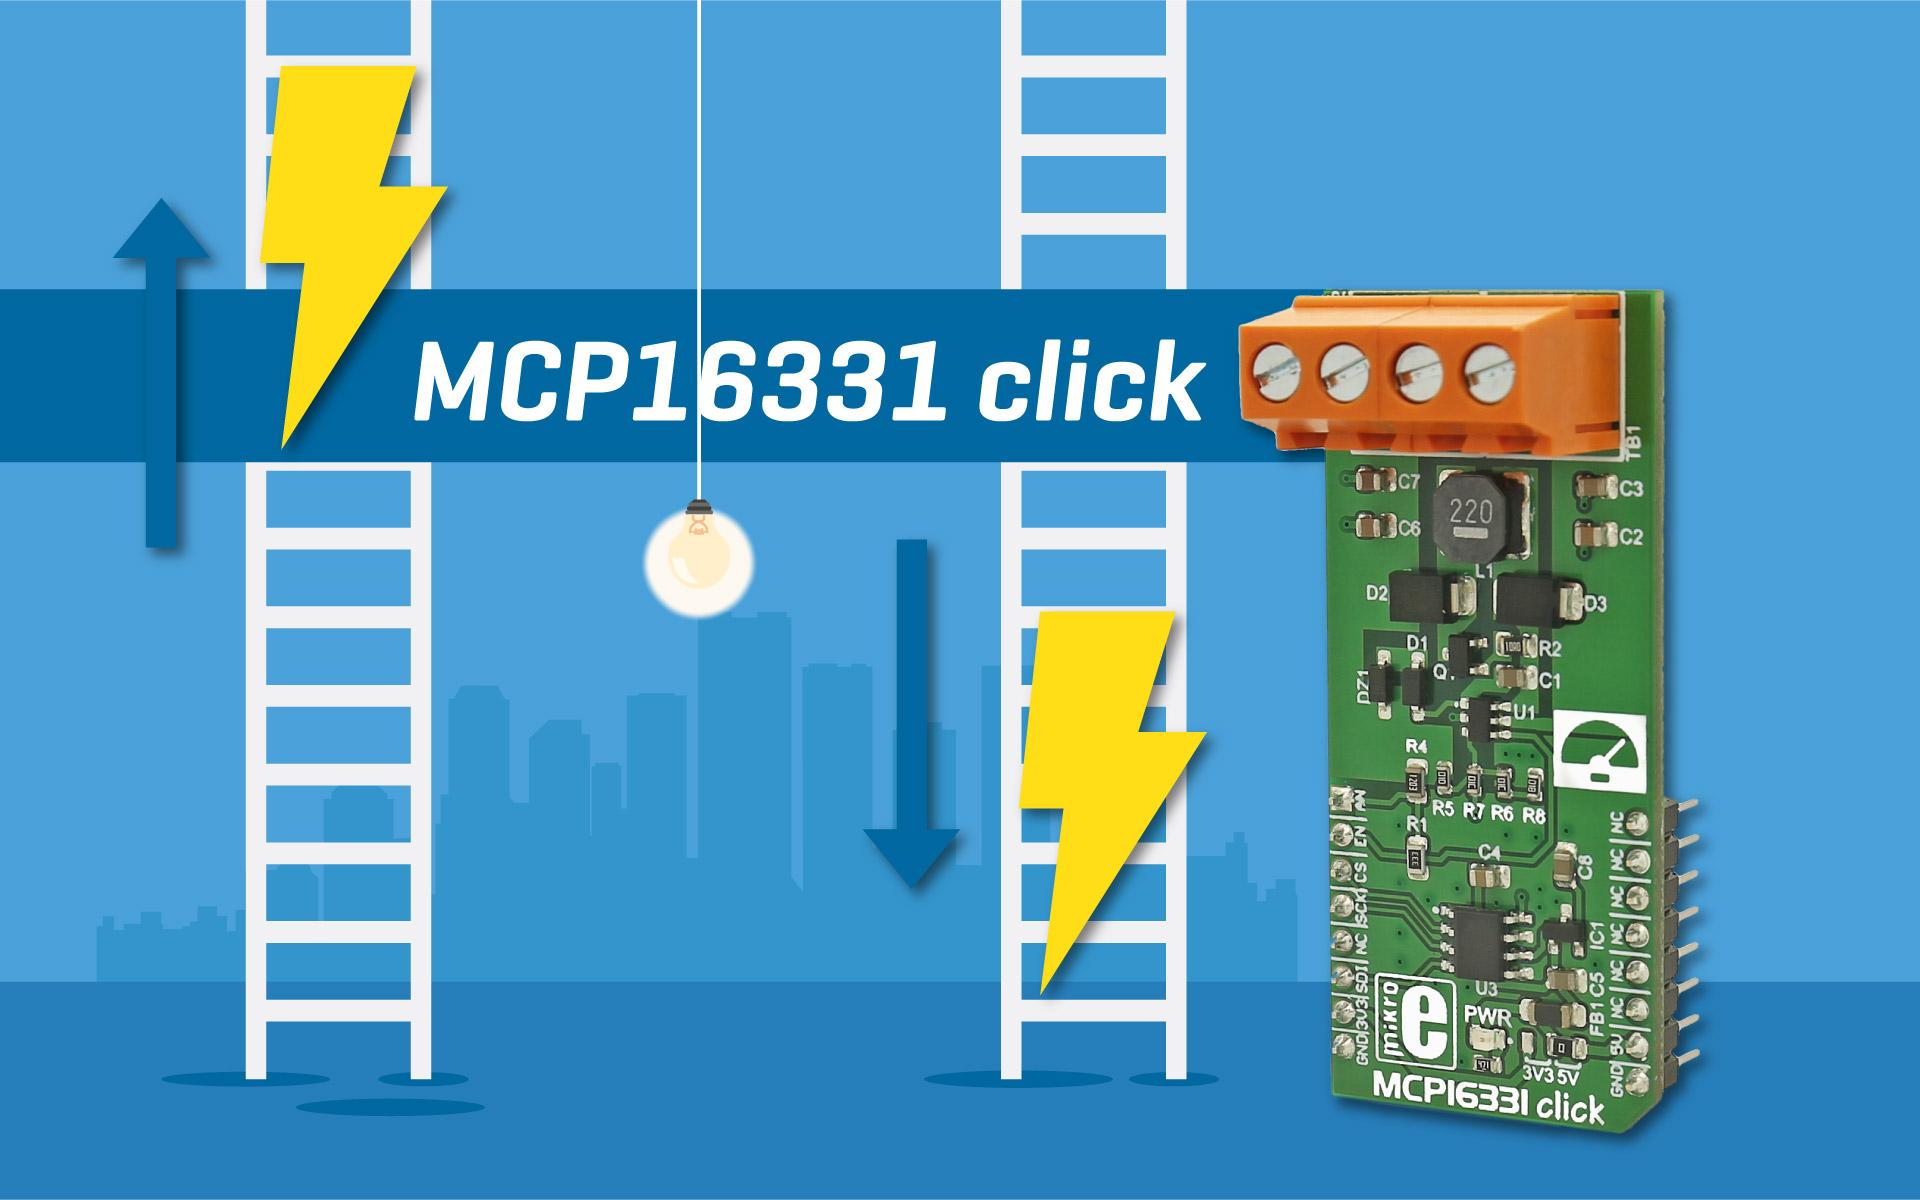 MCP16331 click - buck-boost voltage regulator